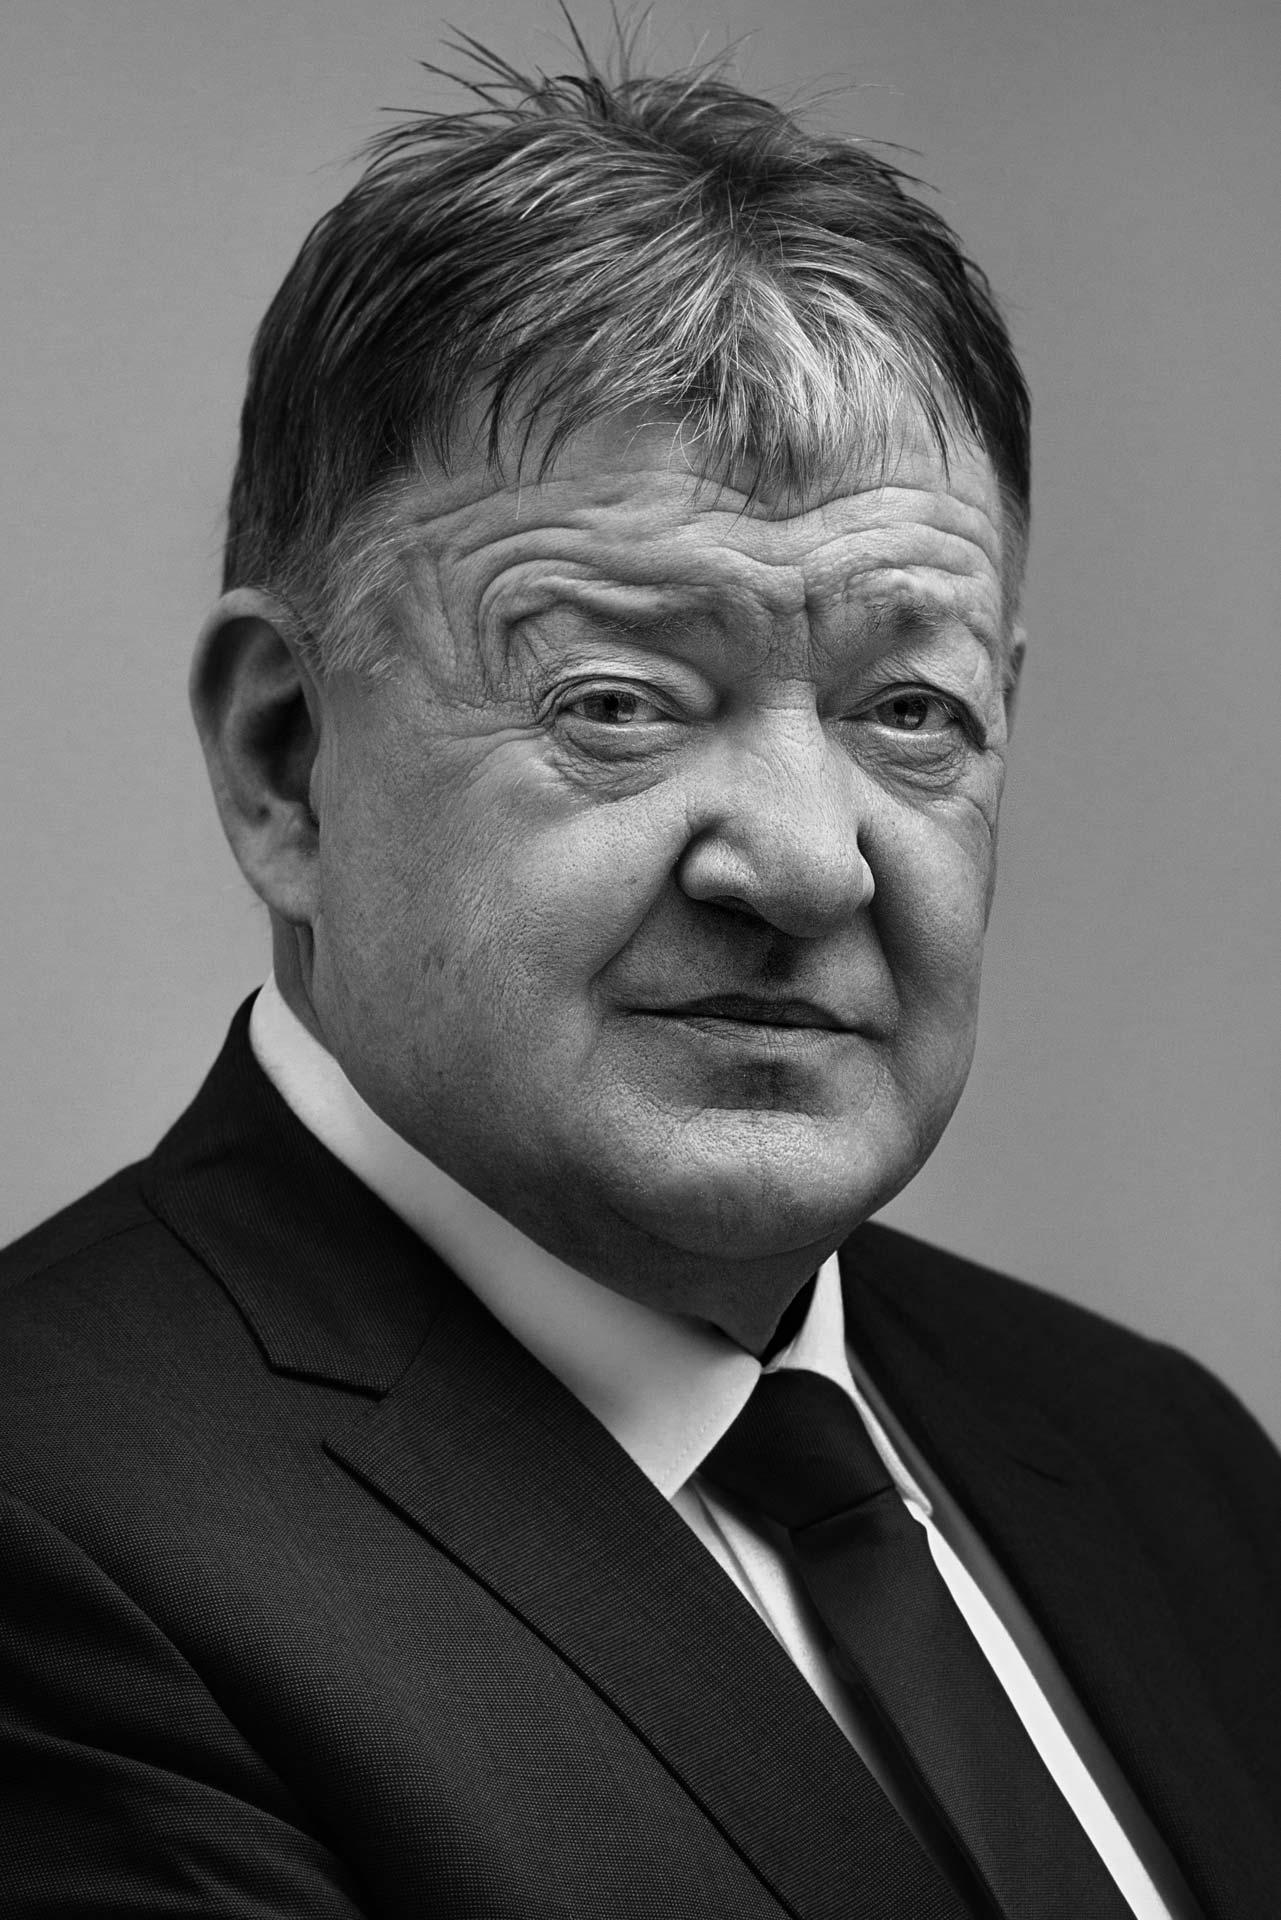 Mr. Clemens Sachs